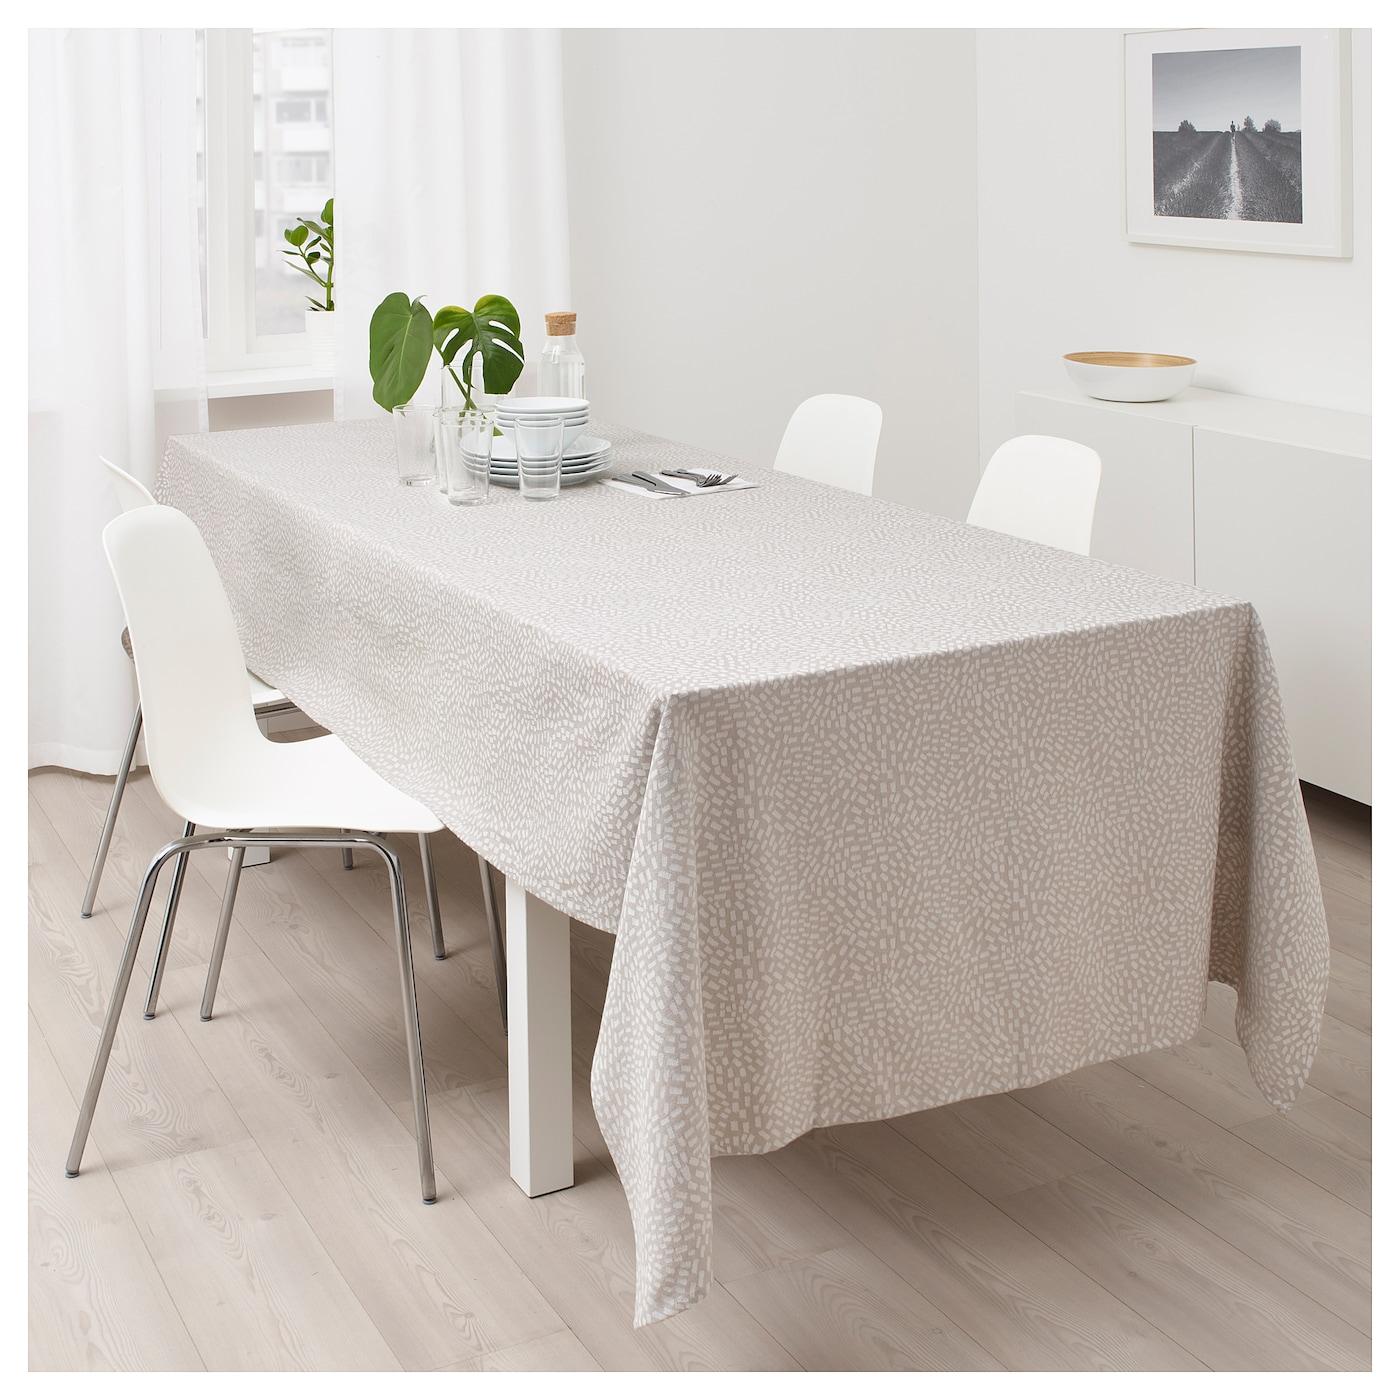 sommar 2018 tafellaken beige 145x320 cm ikea. Black Bedroom Furniture Sets. Home Design Ideas